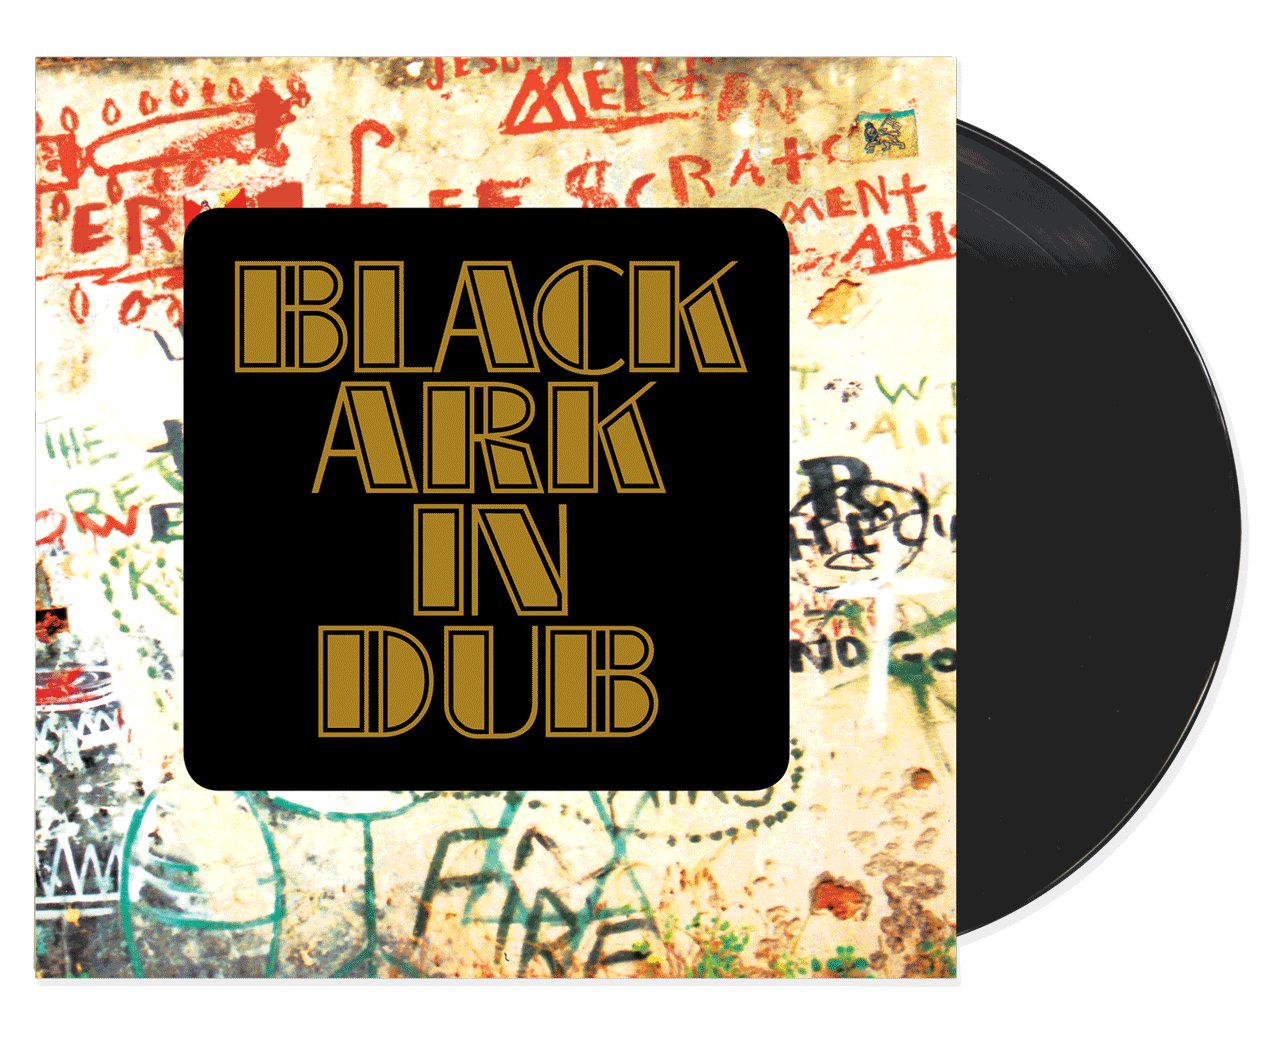 Black Ark In Dub (LP Vinyl)